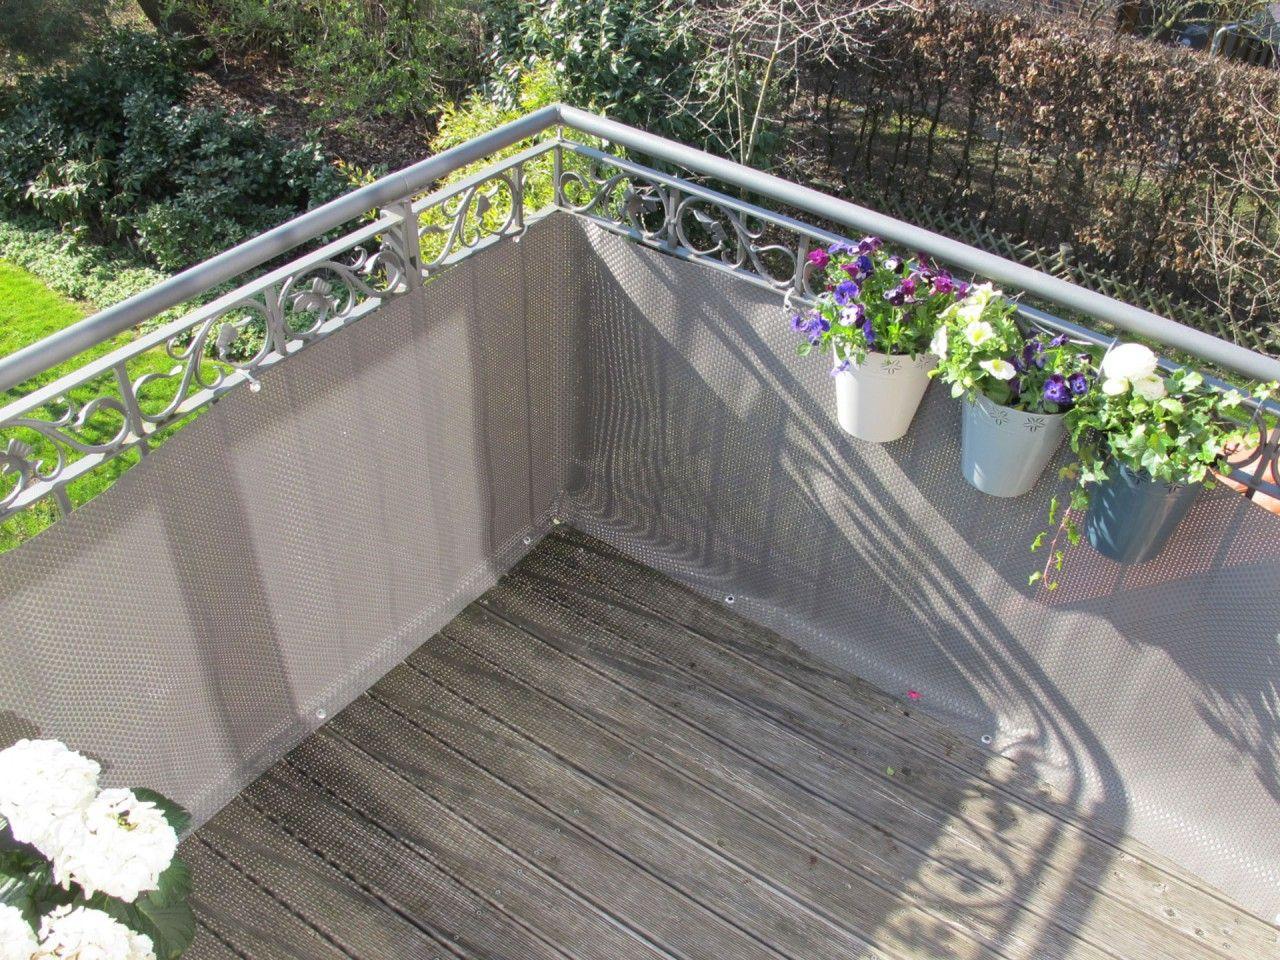 Balkonverkleidung Grau Balkonverkleidung, Balkon